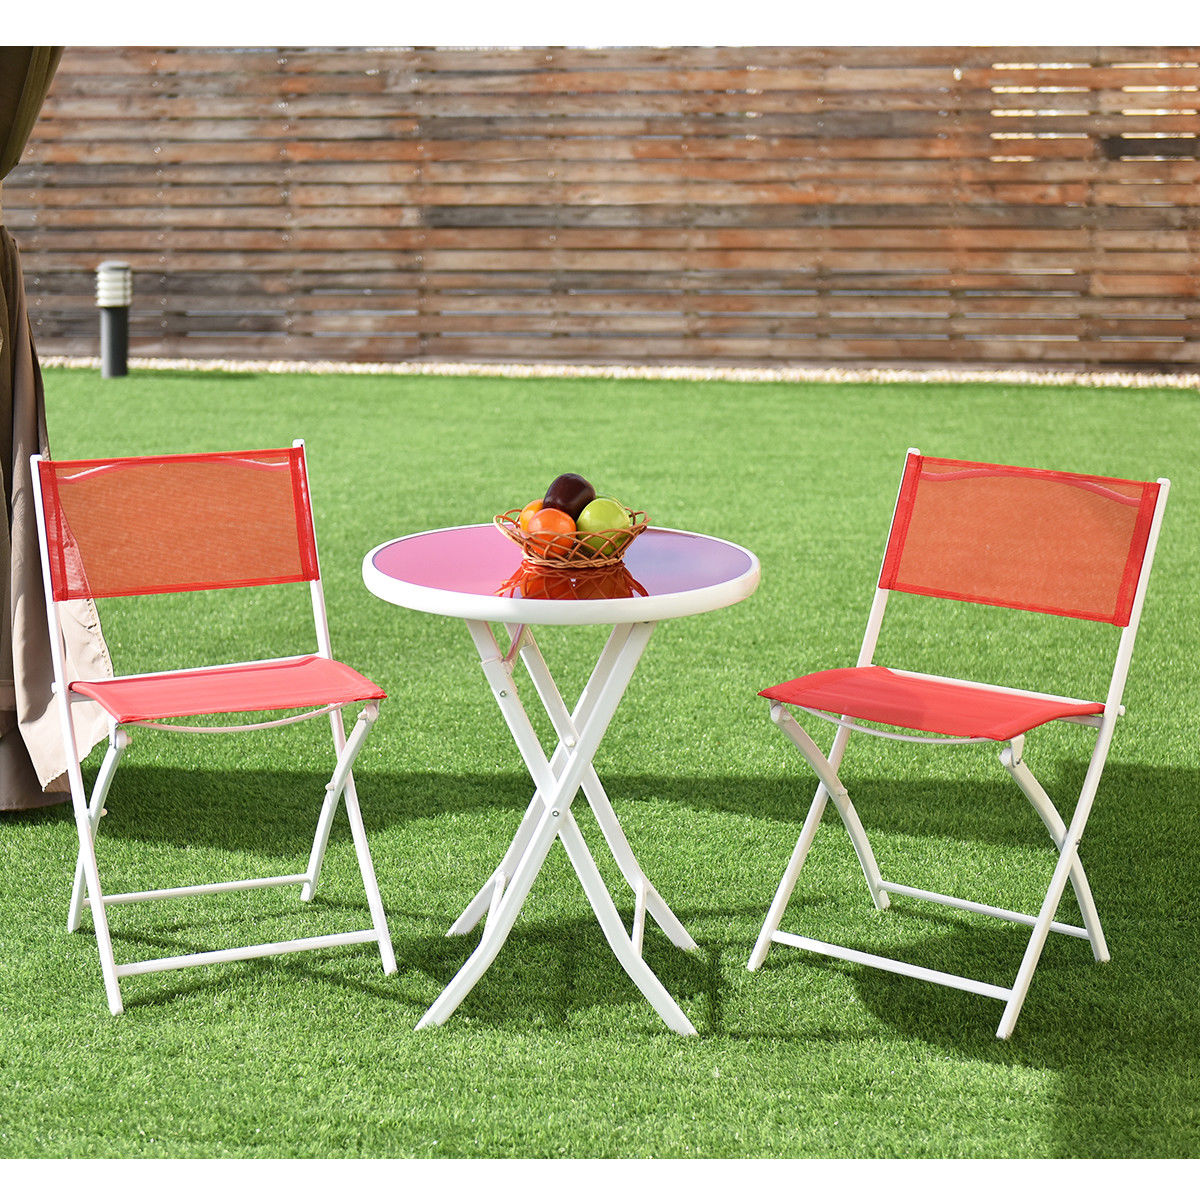 costway 3 pcs folding bistro table chairs set garden backyard patio furniture red op3355re